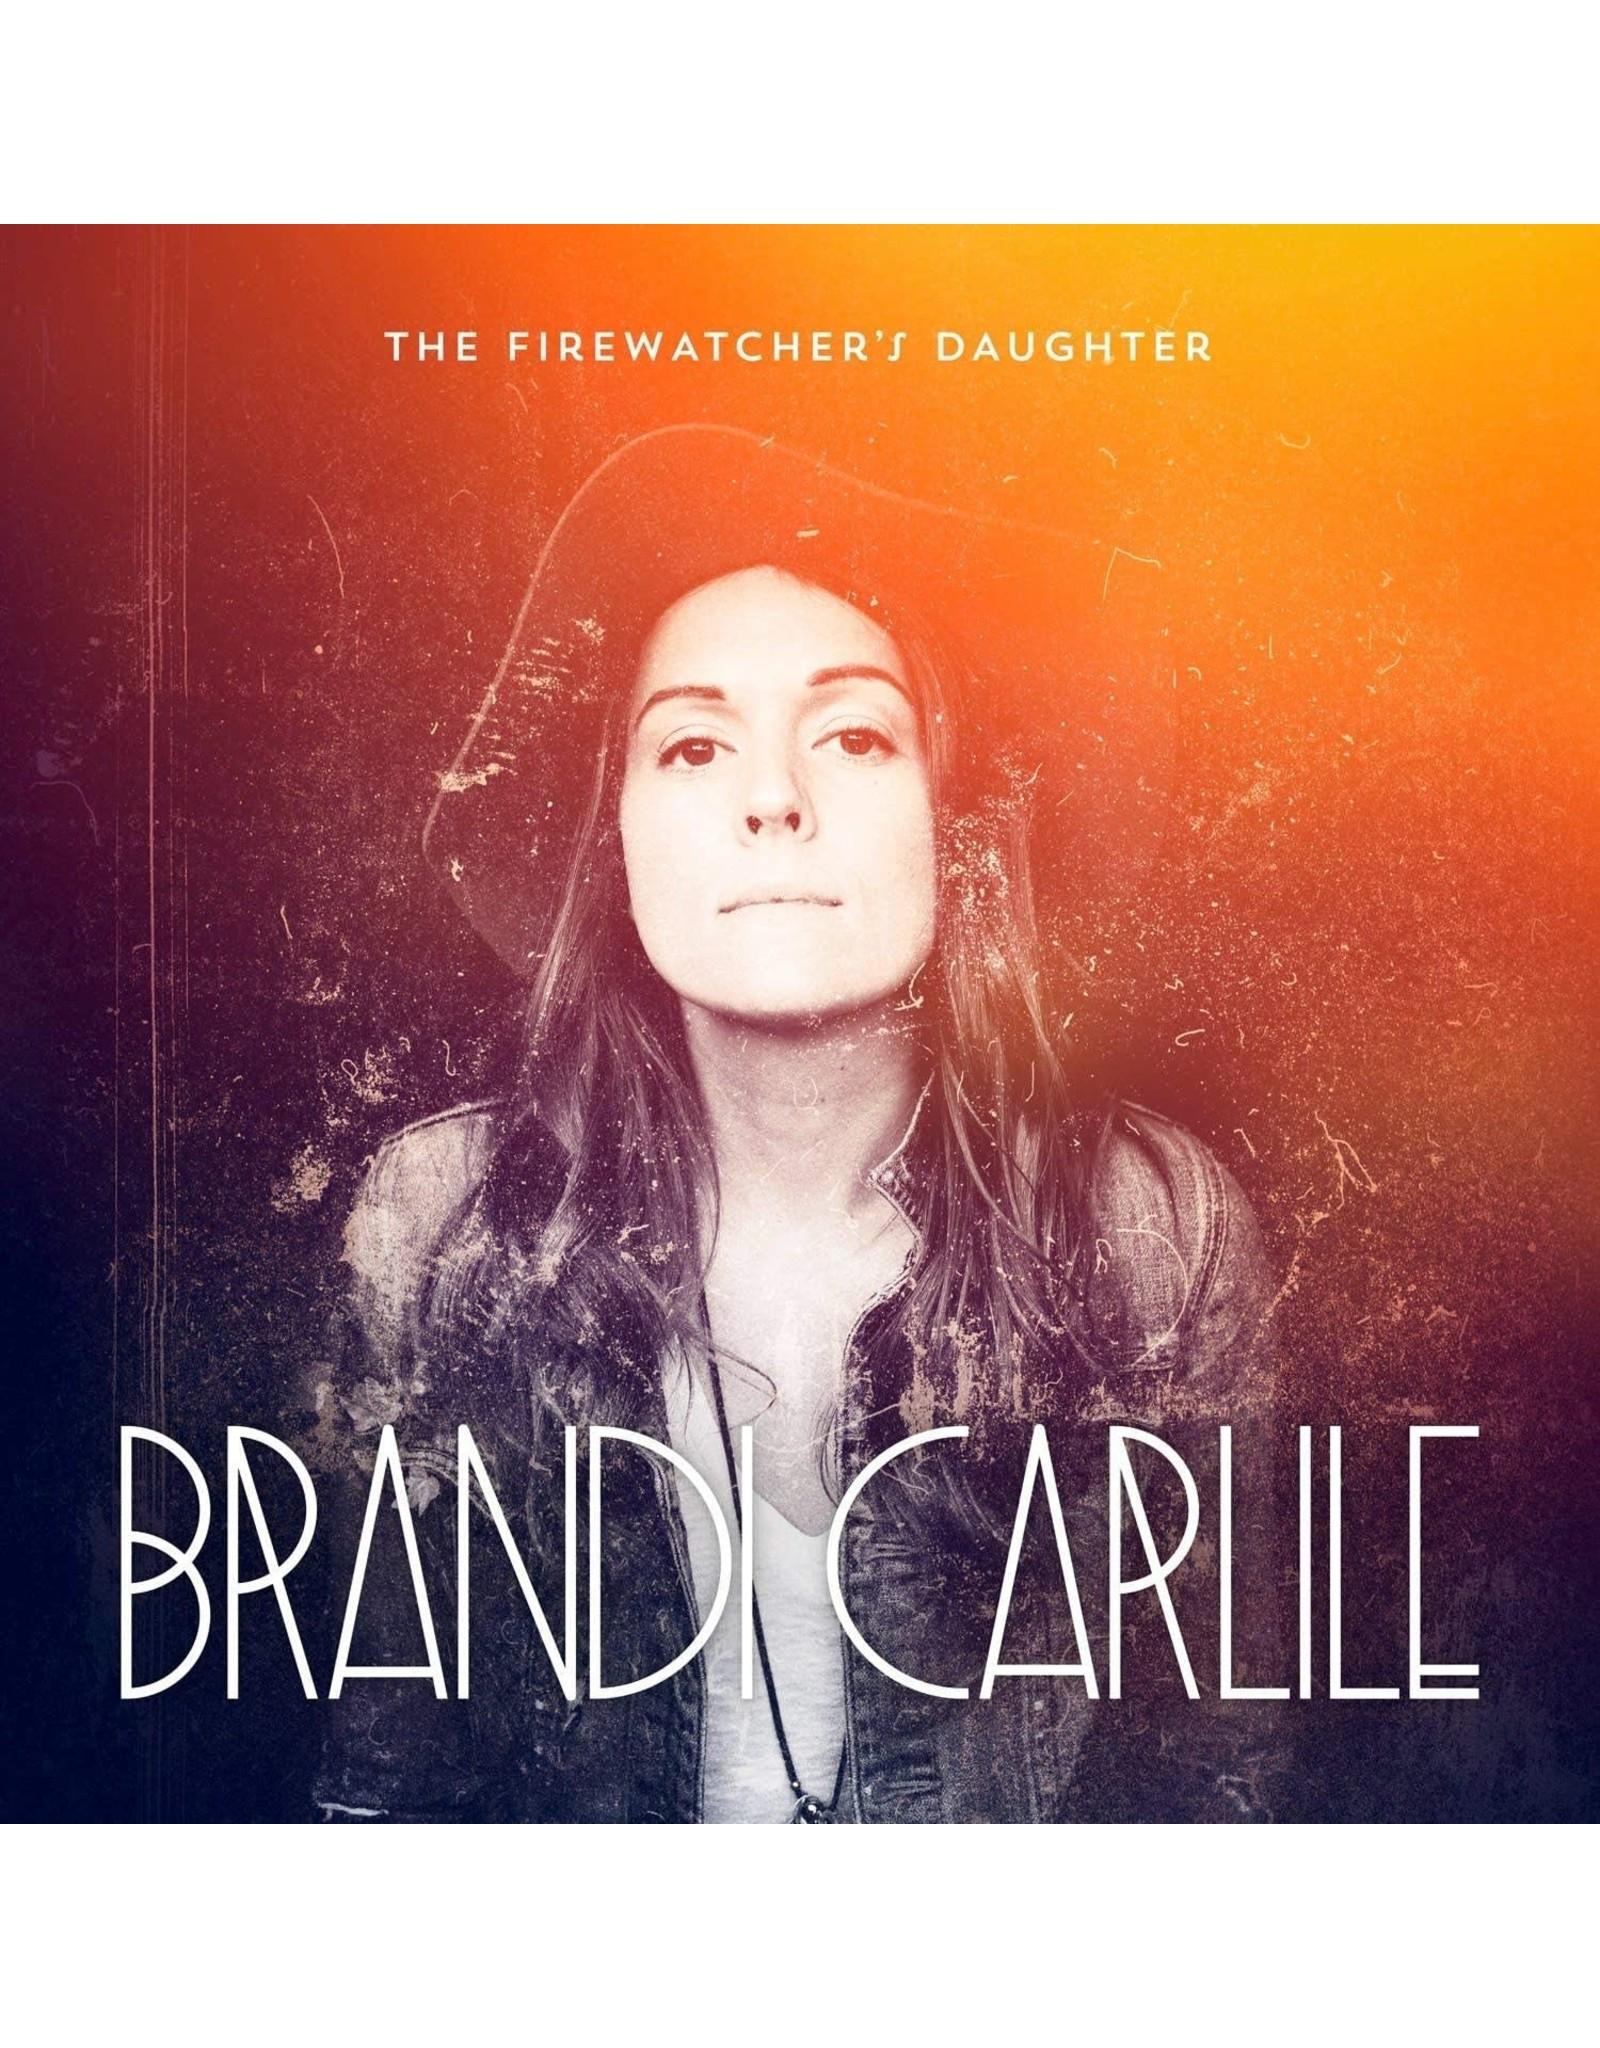 Brandi Carlile - The Firewatcher's Daughter (White Vinyl)